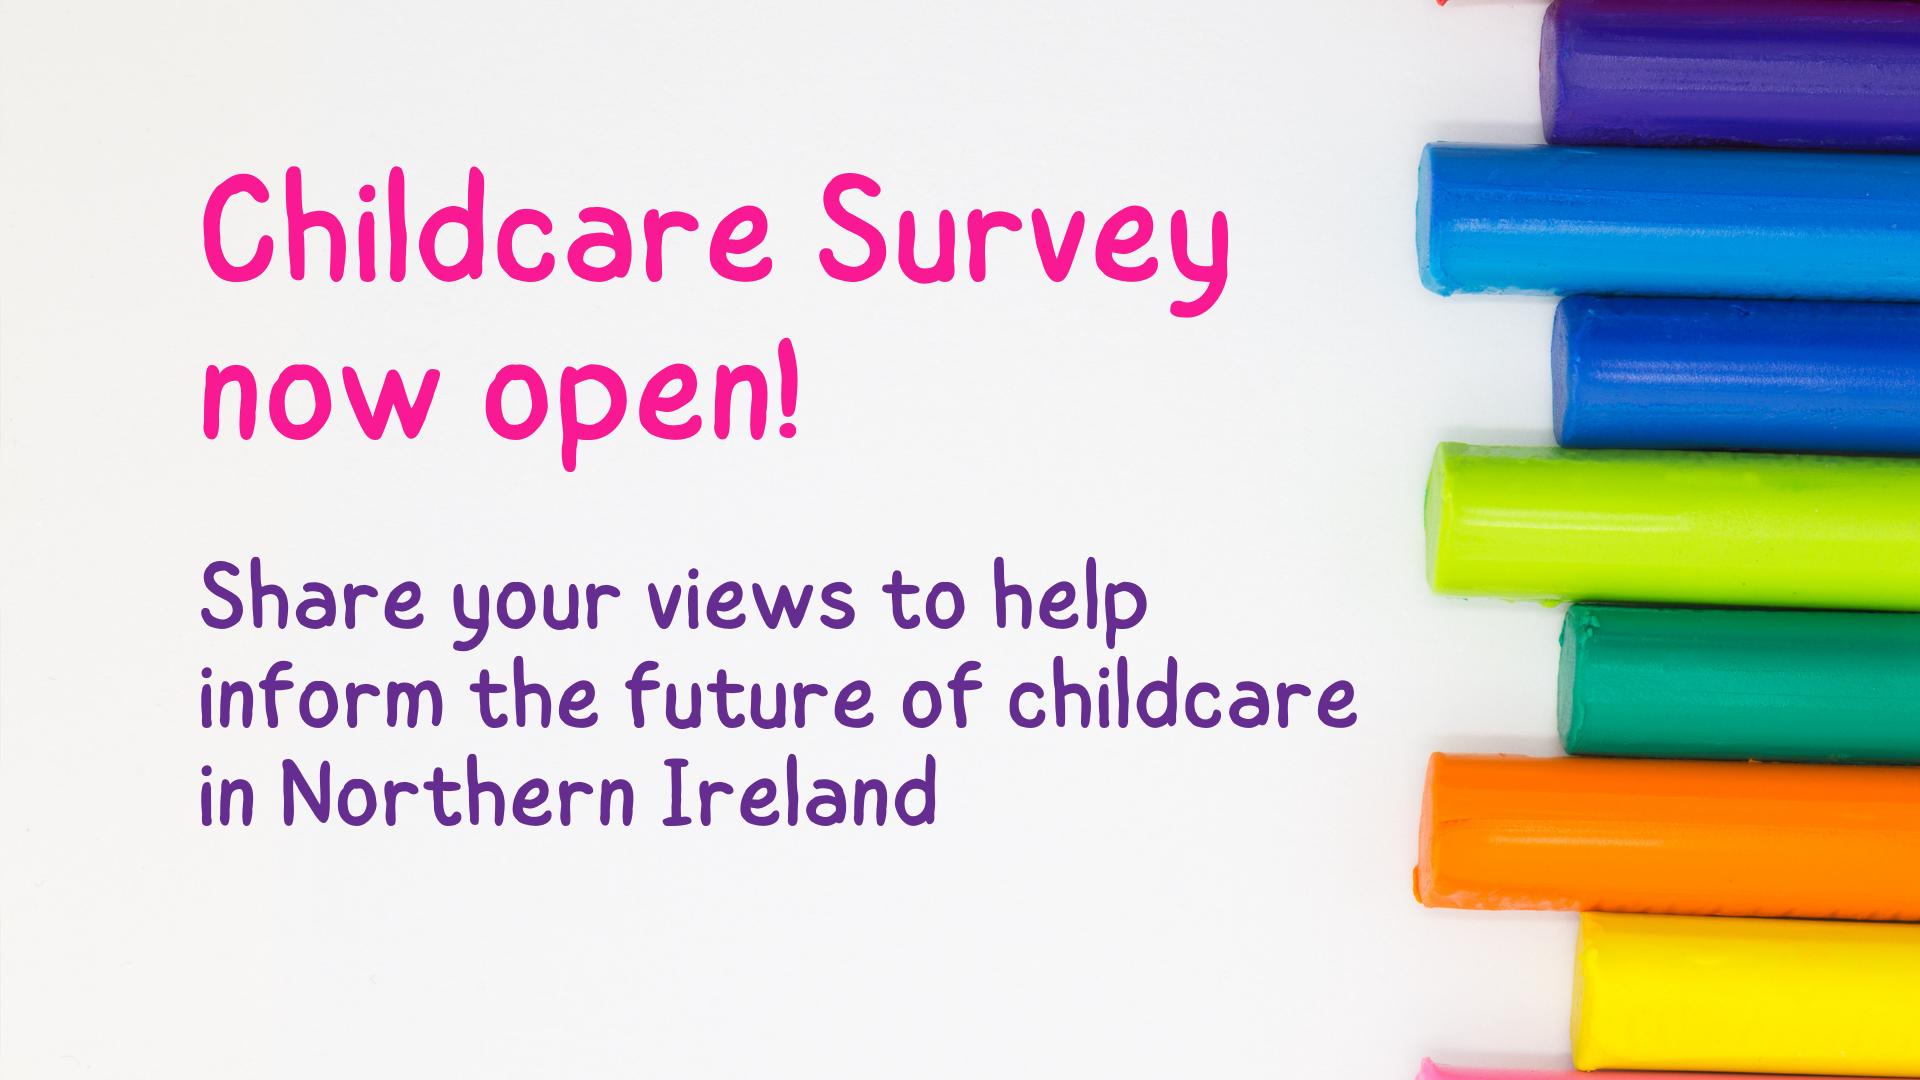 Northern Ireland Childcare Survey – now open!